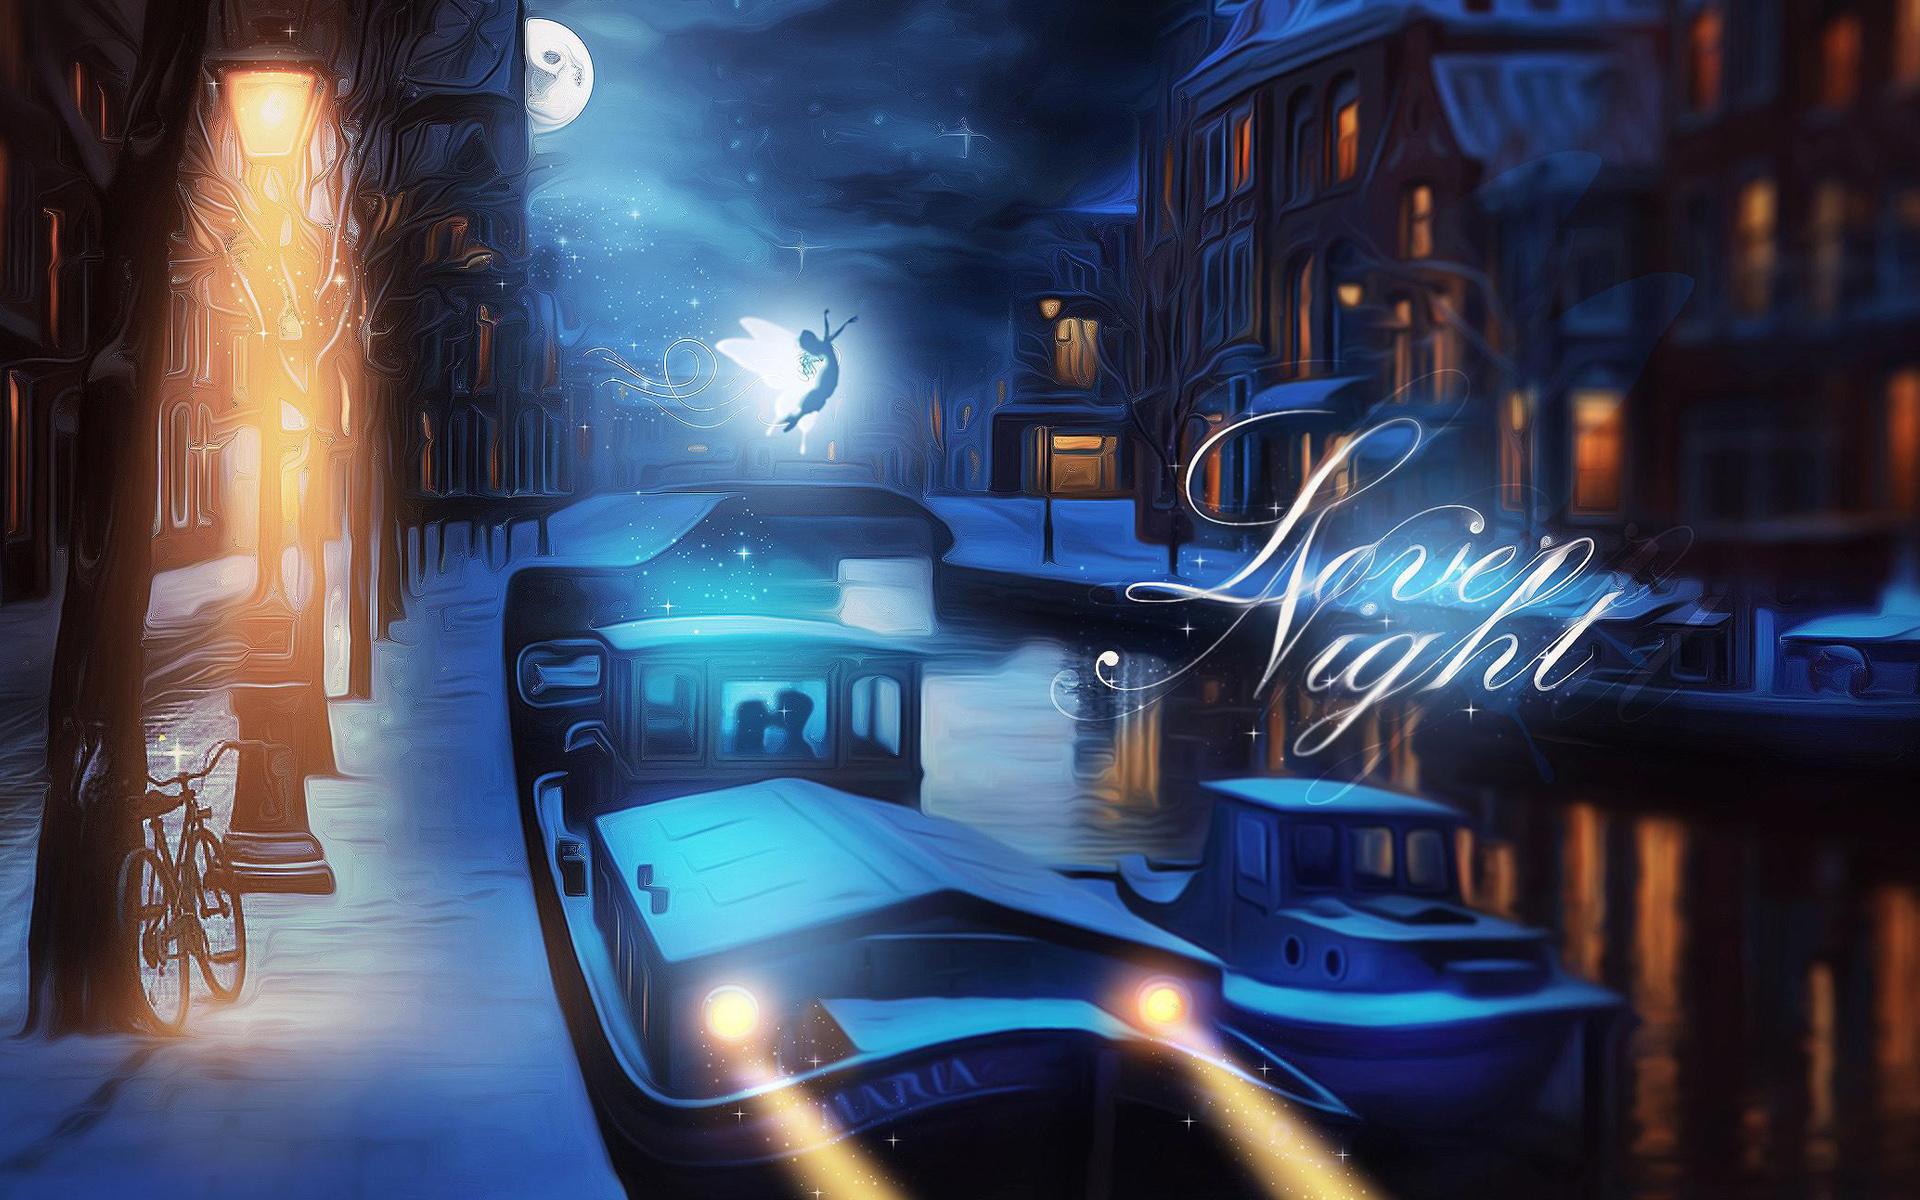 Lovely Night Digital Art Hd Artist 4k Wallpapers Images